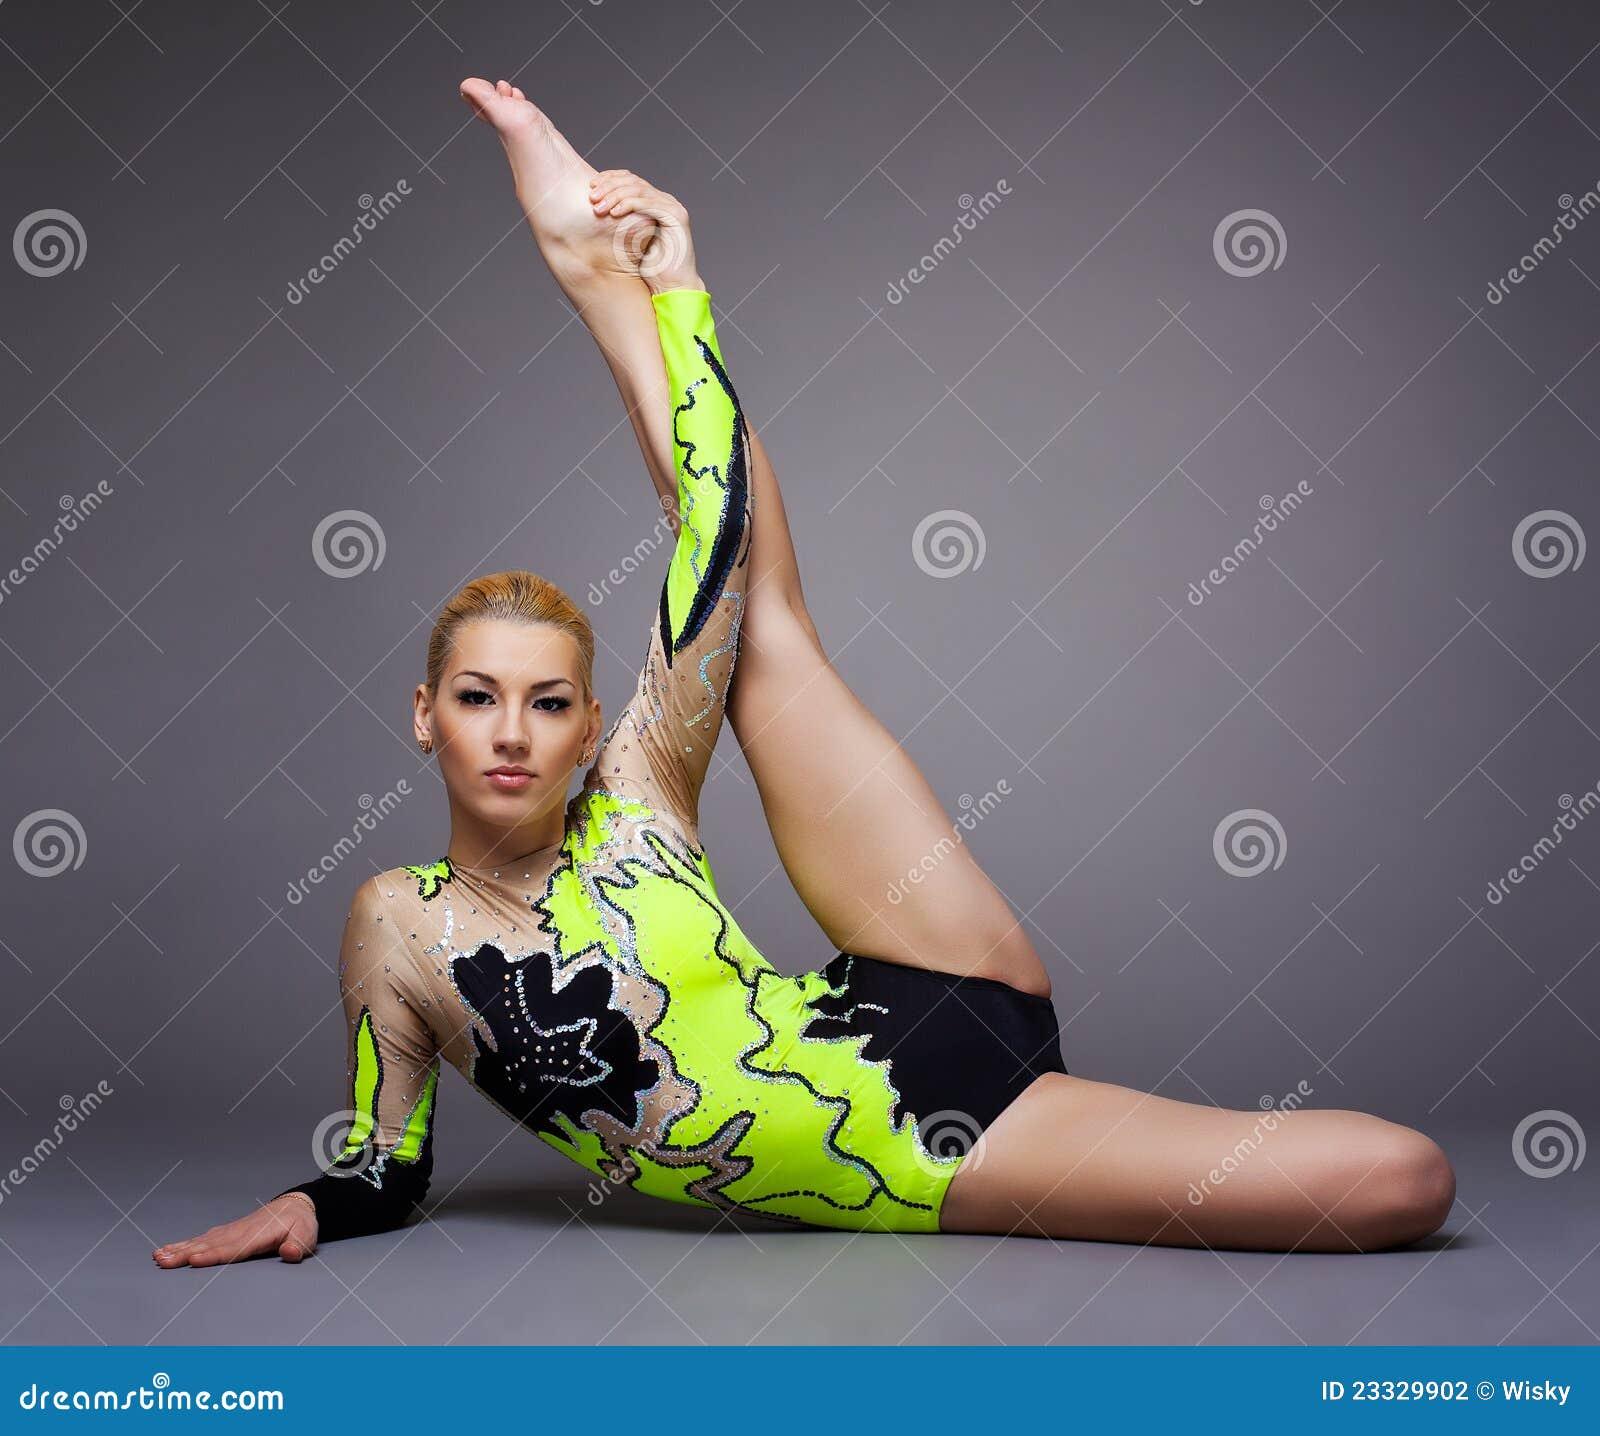 Sweet Gymnasts 30